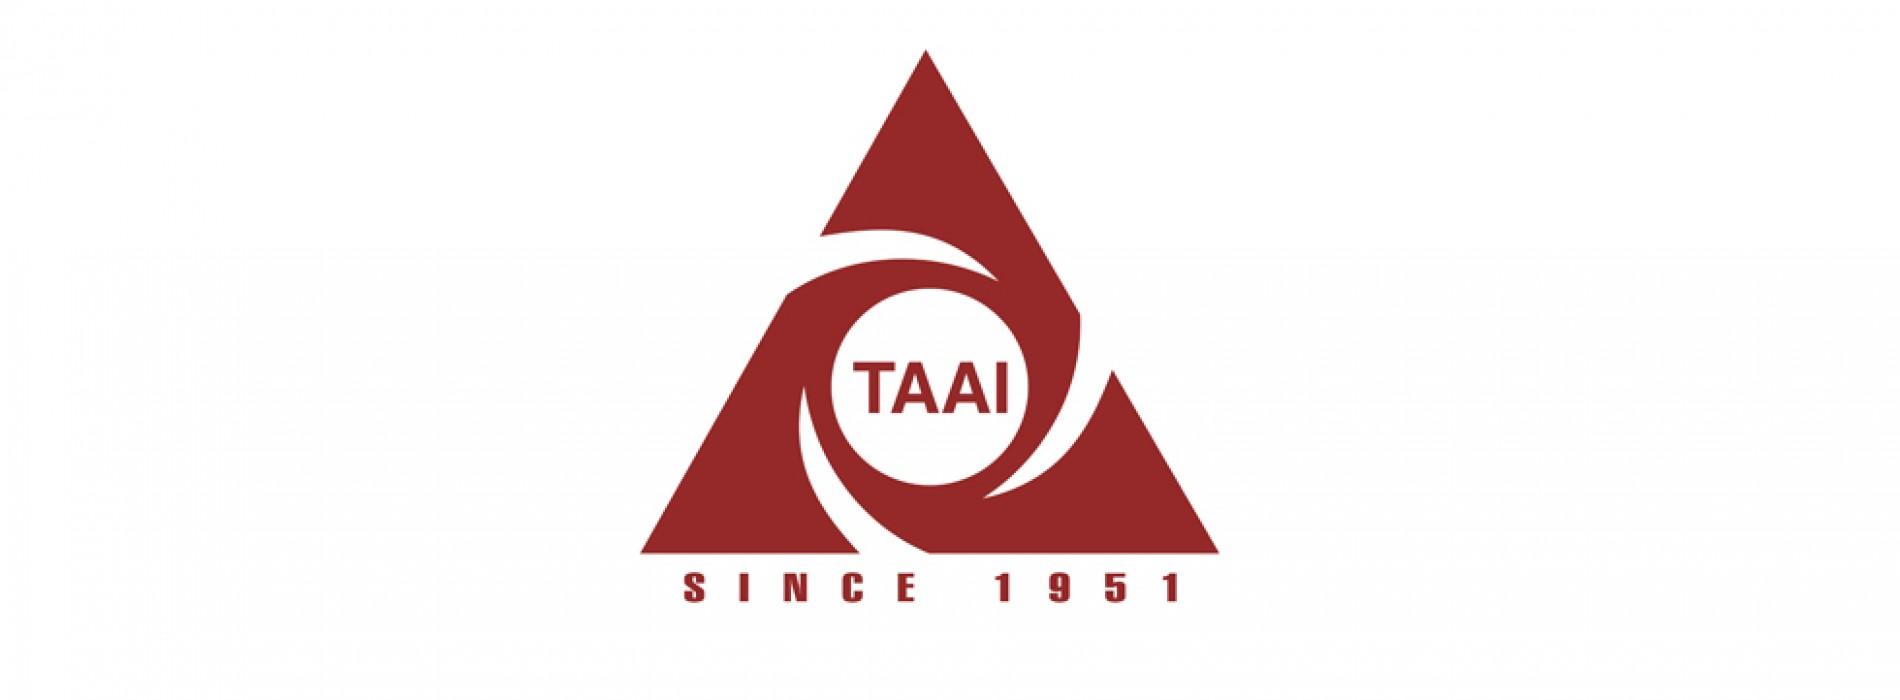 Zubin Karkaria honoured with TAAI's 'Award of Distinction'